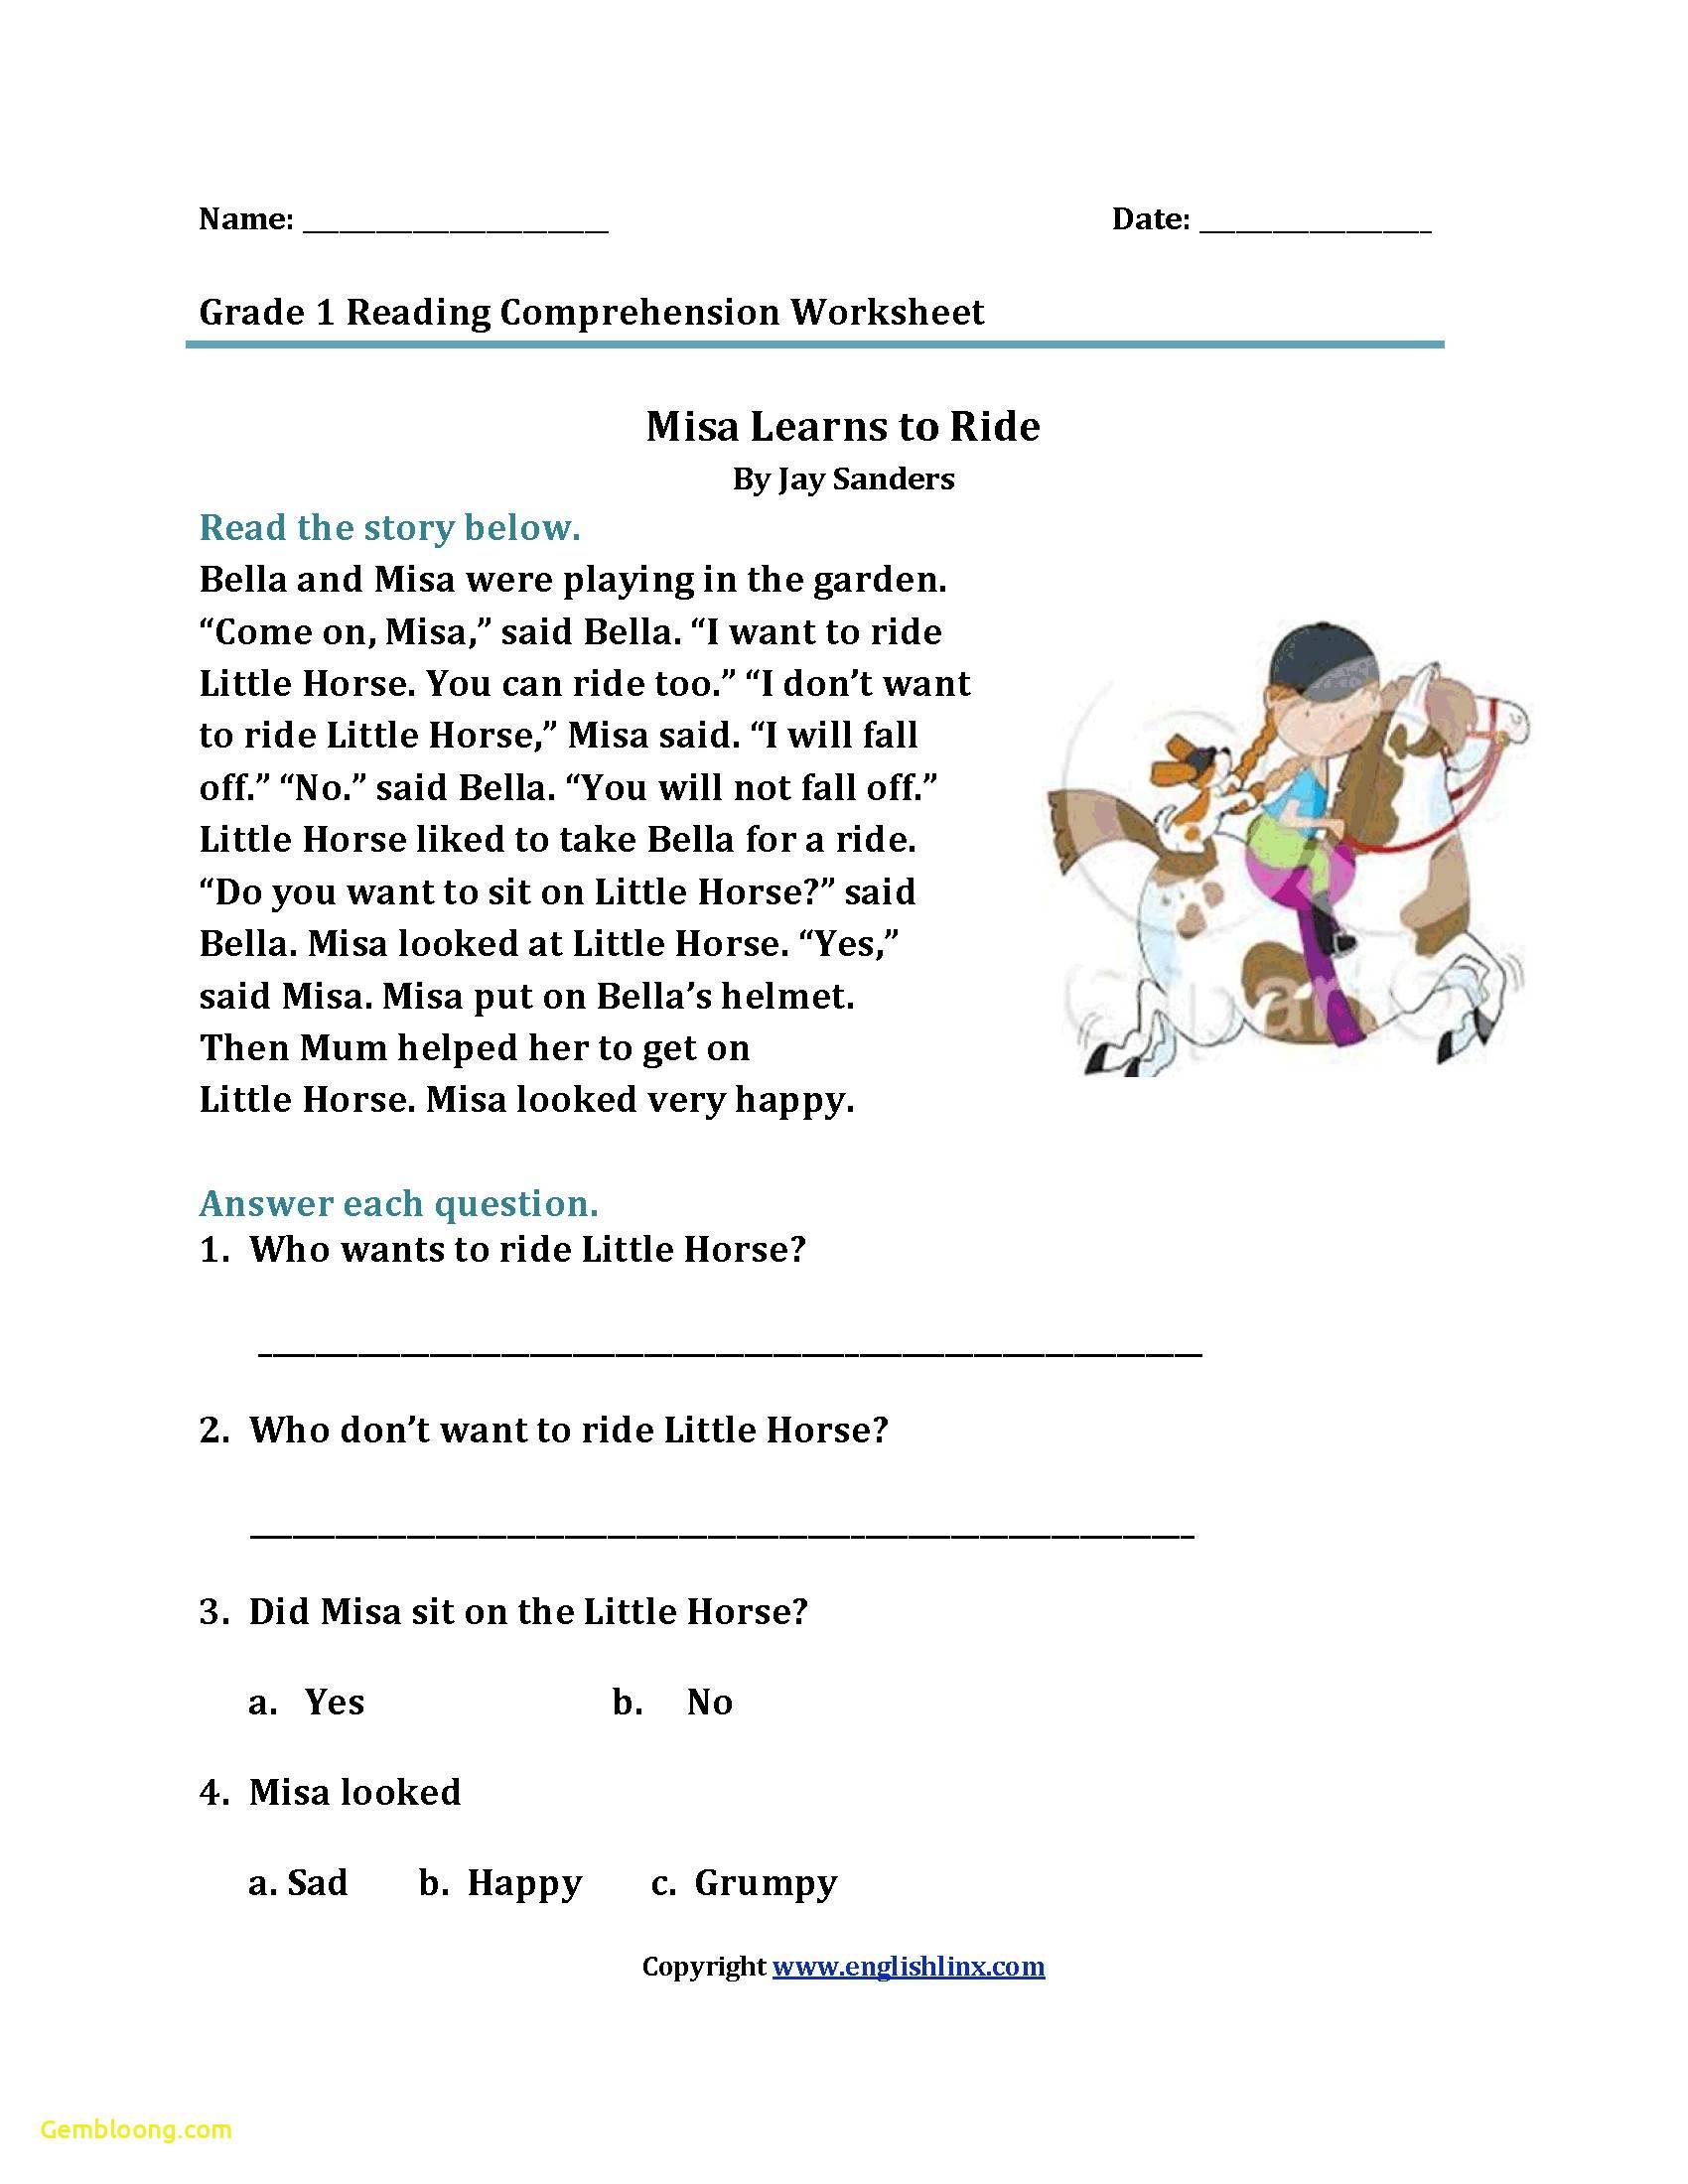 Reading Comprehension Worksheets For 1St Grade - Cramerforcongress | Free Printable Grade 1 Reading Comprehension Worksheets